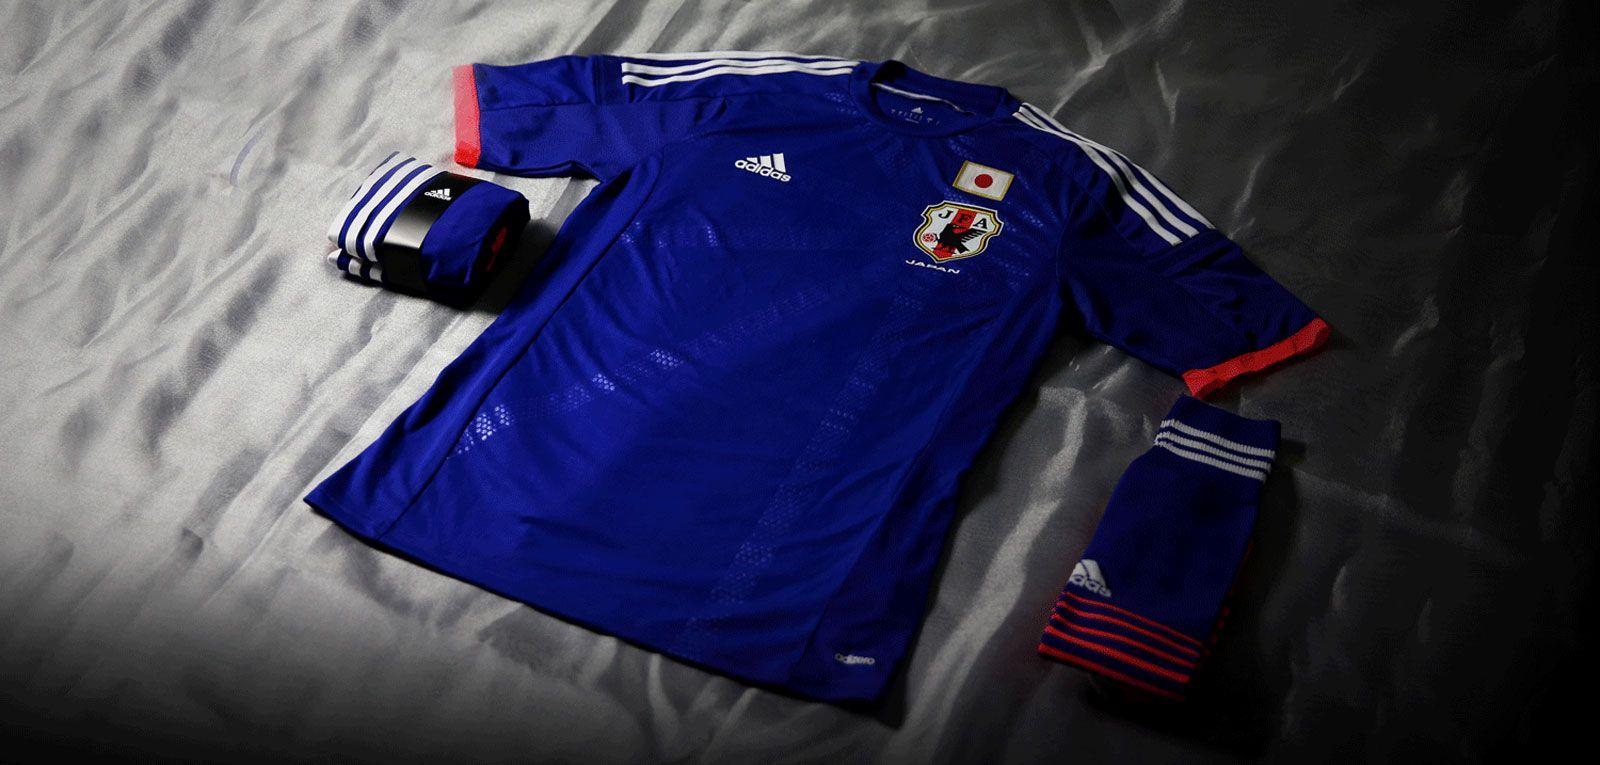 Japan National Football Team Background 7